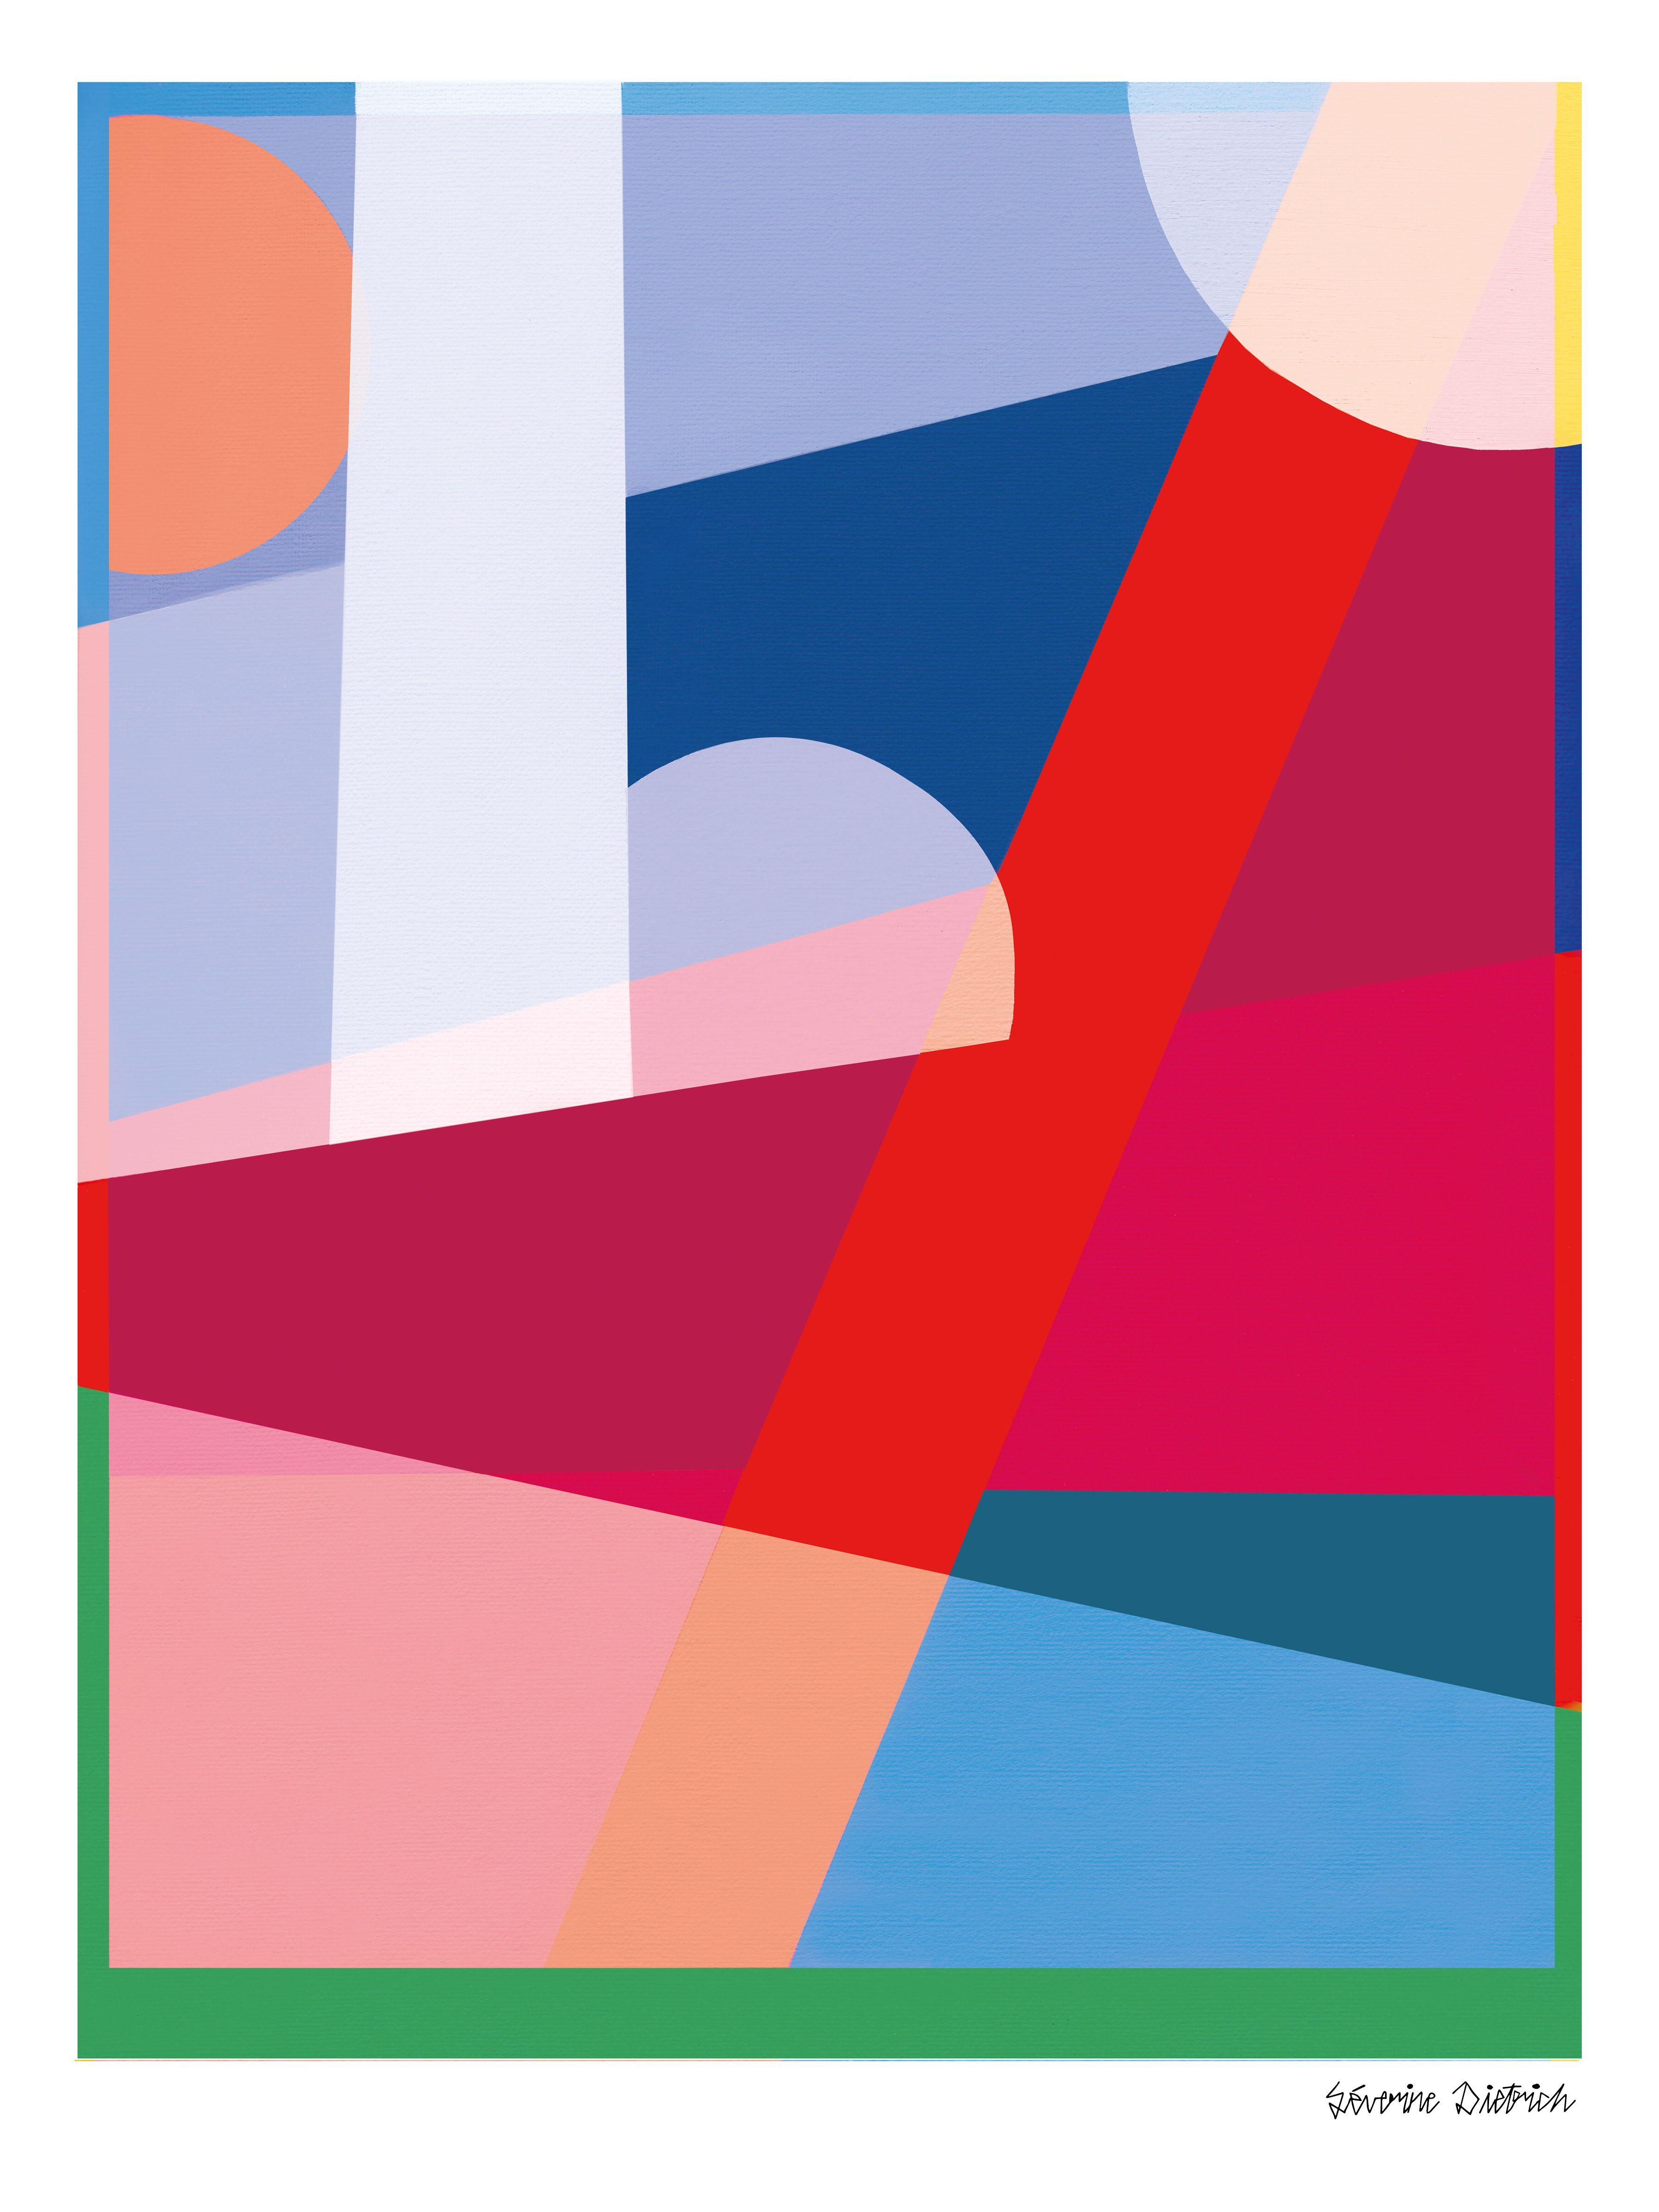 Séverine Dietrich Summer en 2019 Illustration et Peinture